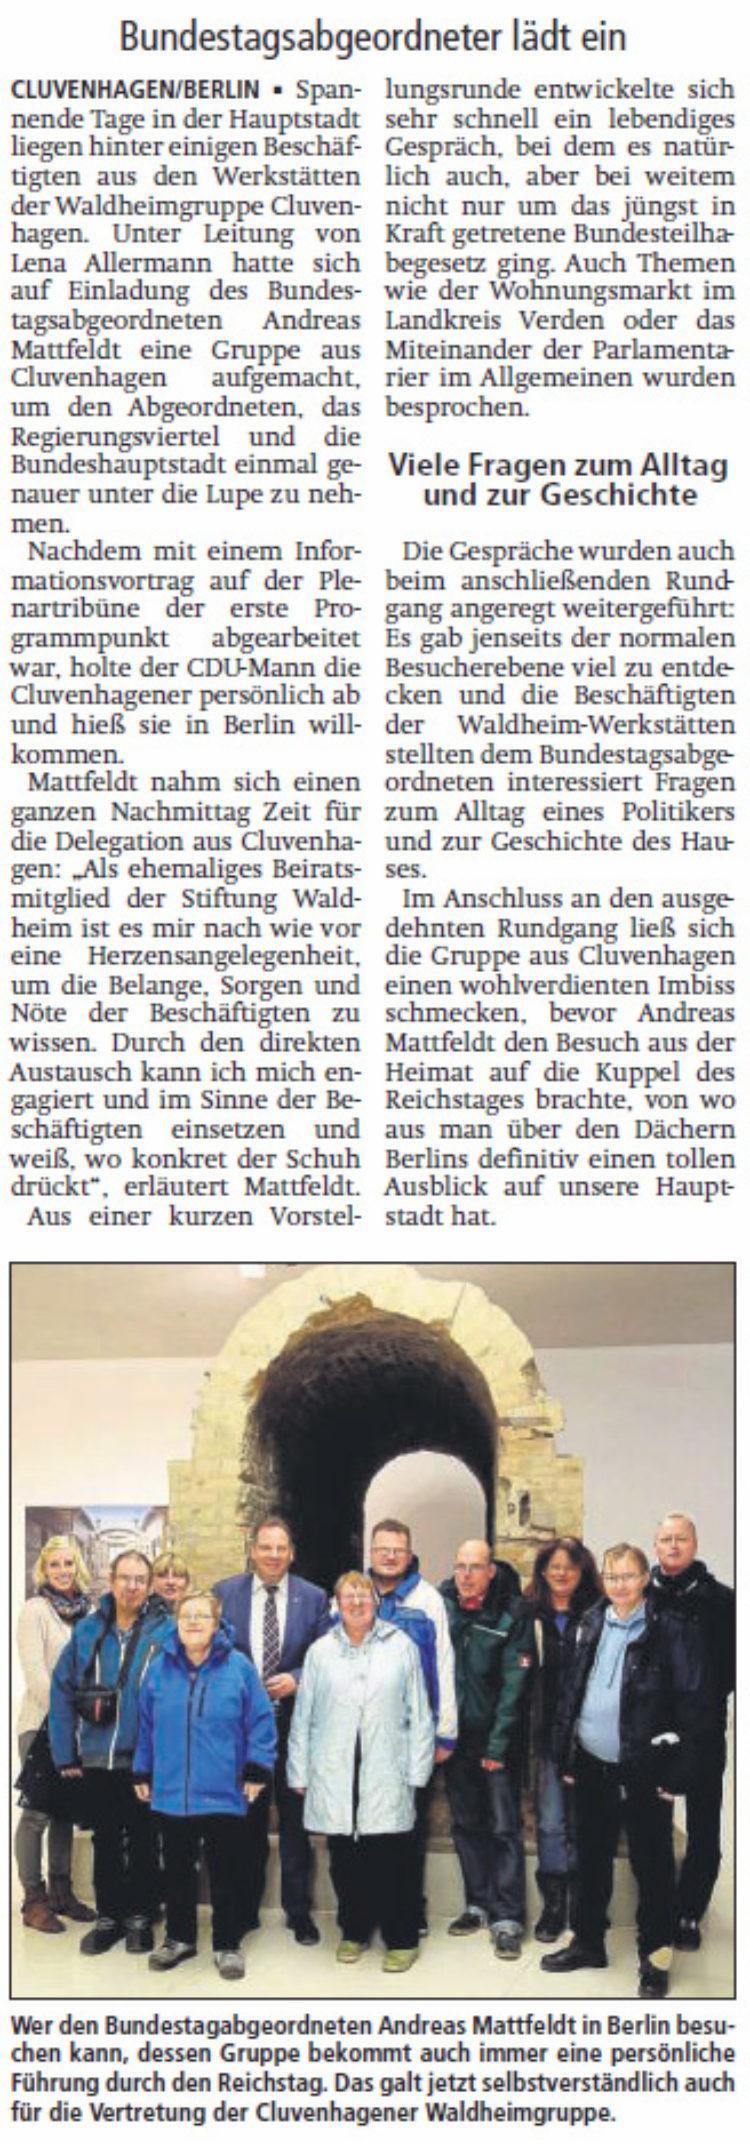 Politik hautnah: Waldheim in Berlin